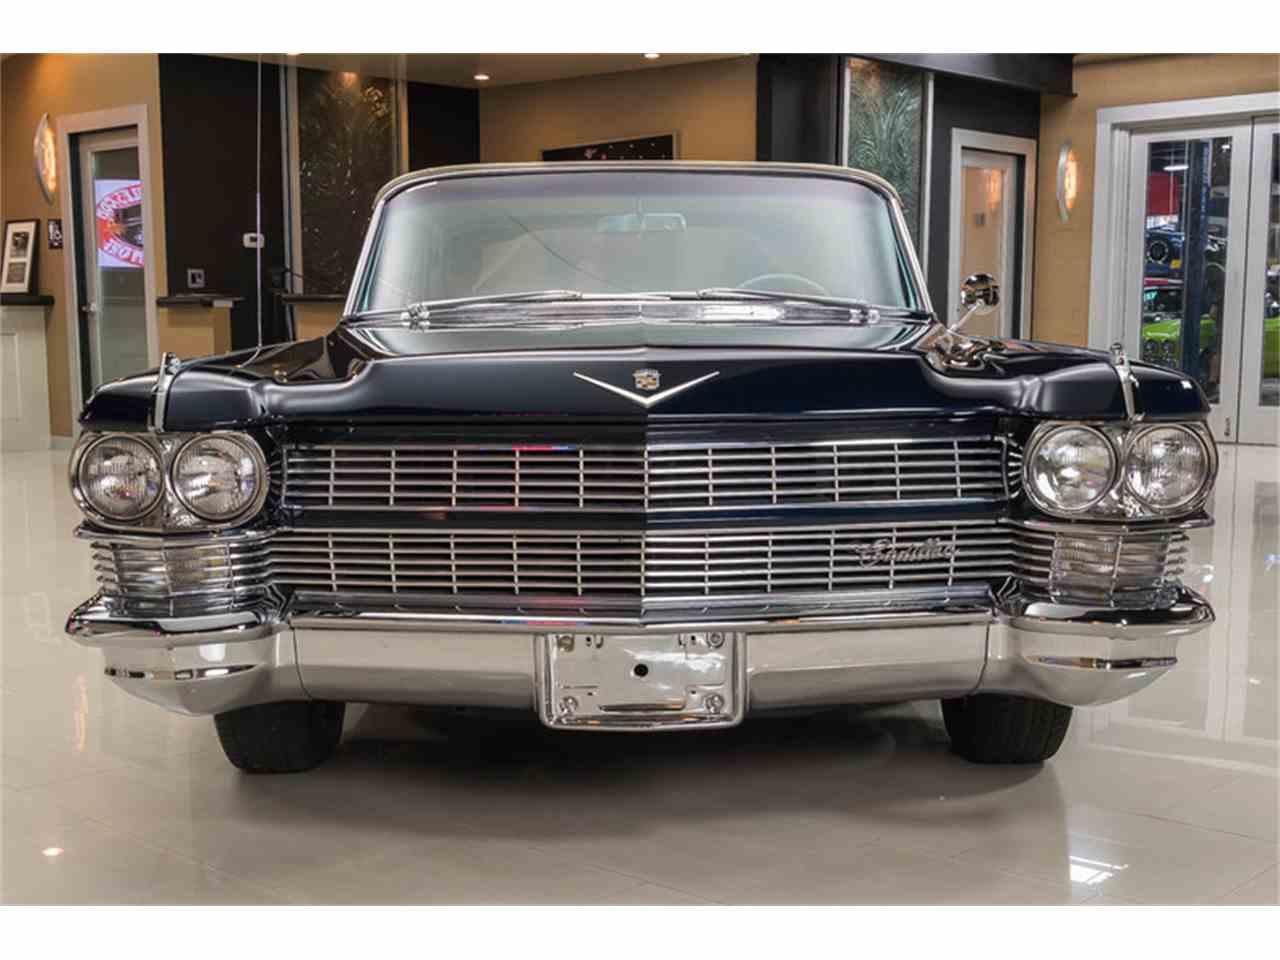 1964 Cadillac DeVille for Sale | ClassicCars.com | CC-987991